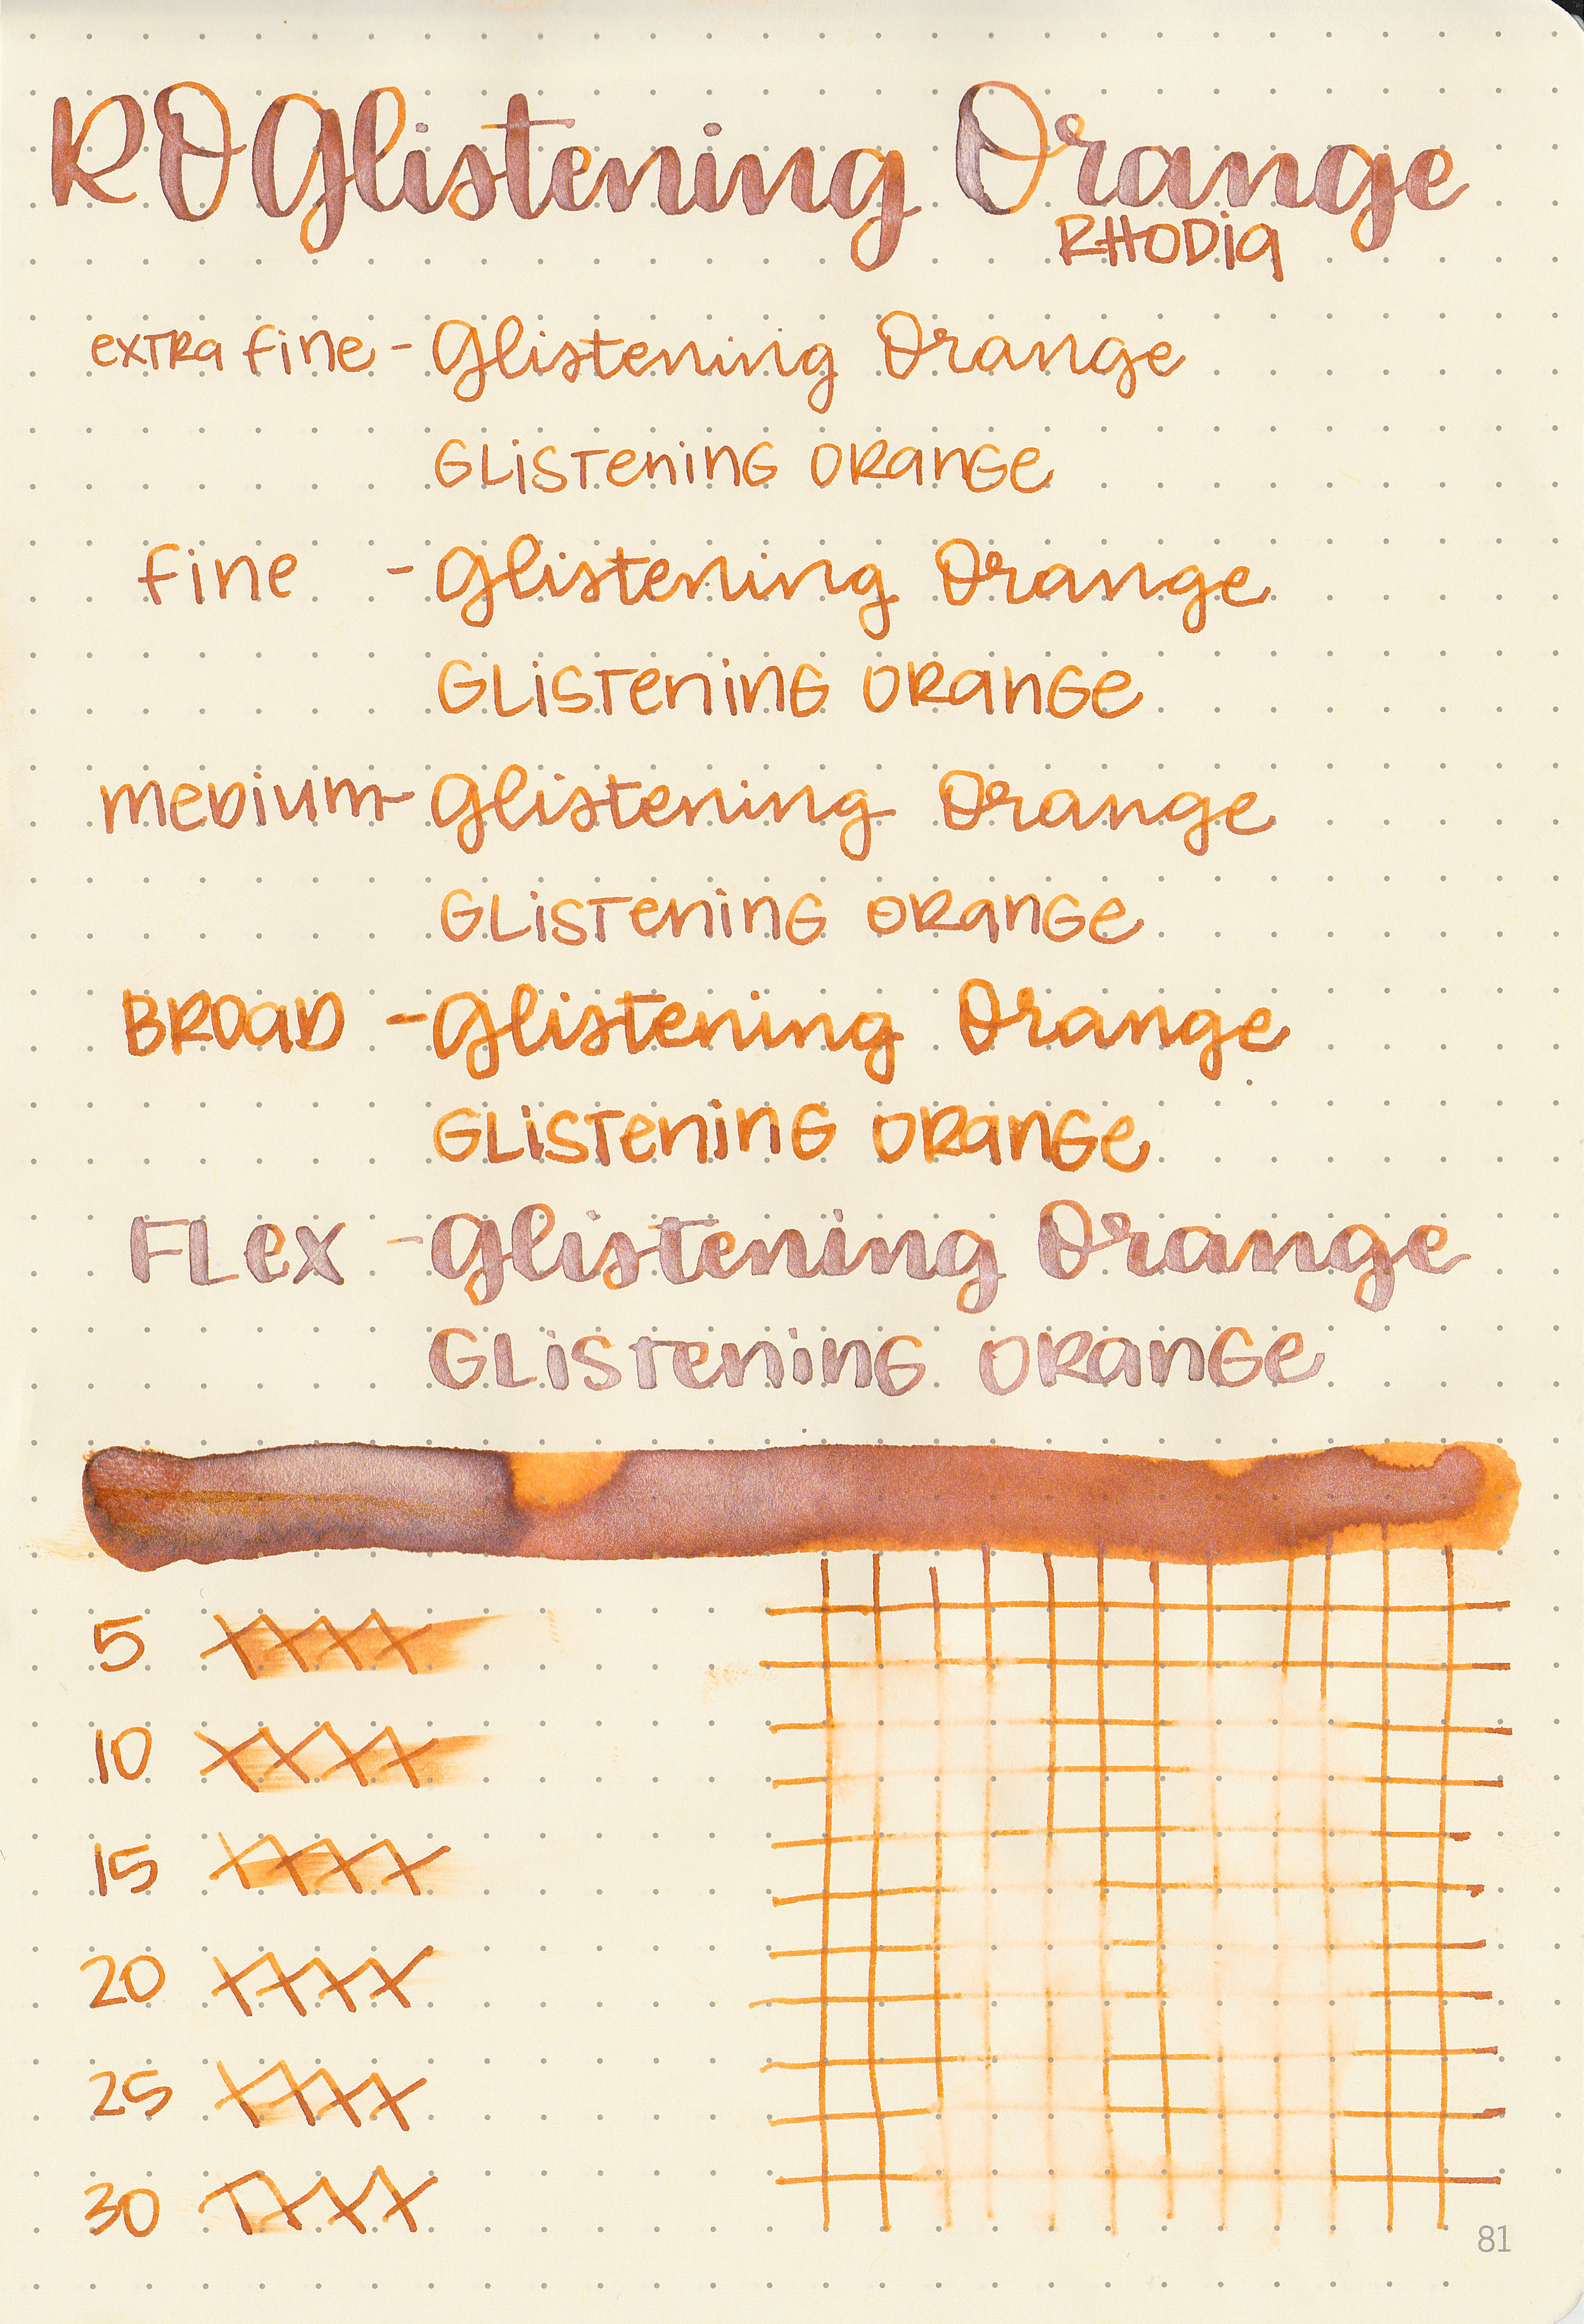 ro-glistening-orange-rumble-12.jpg